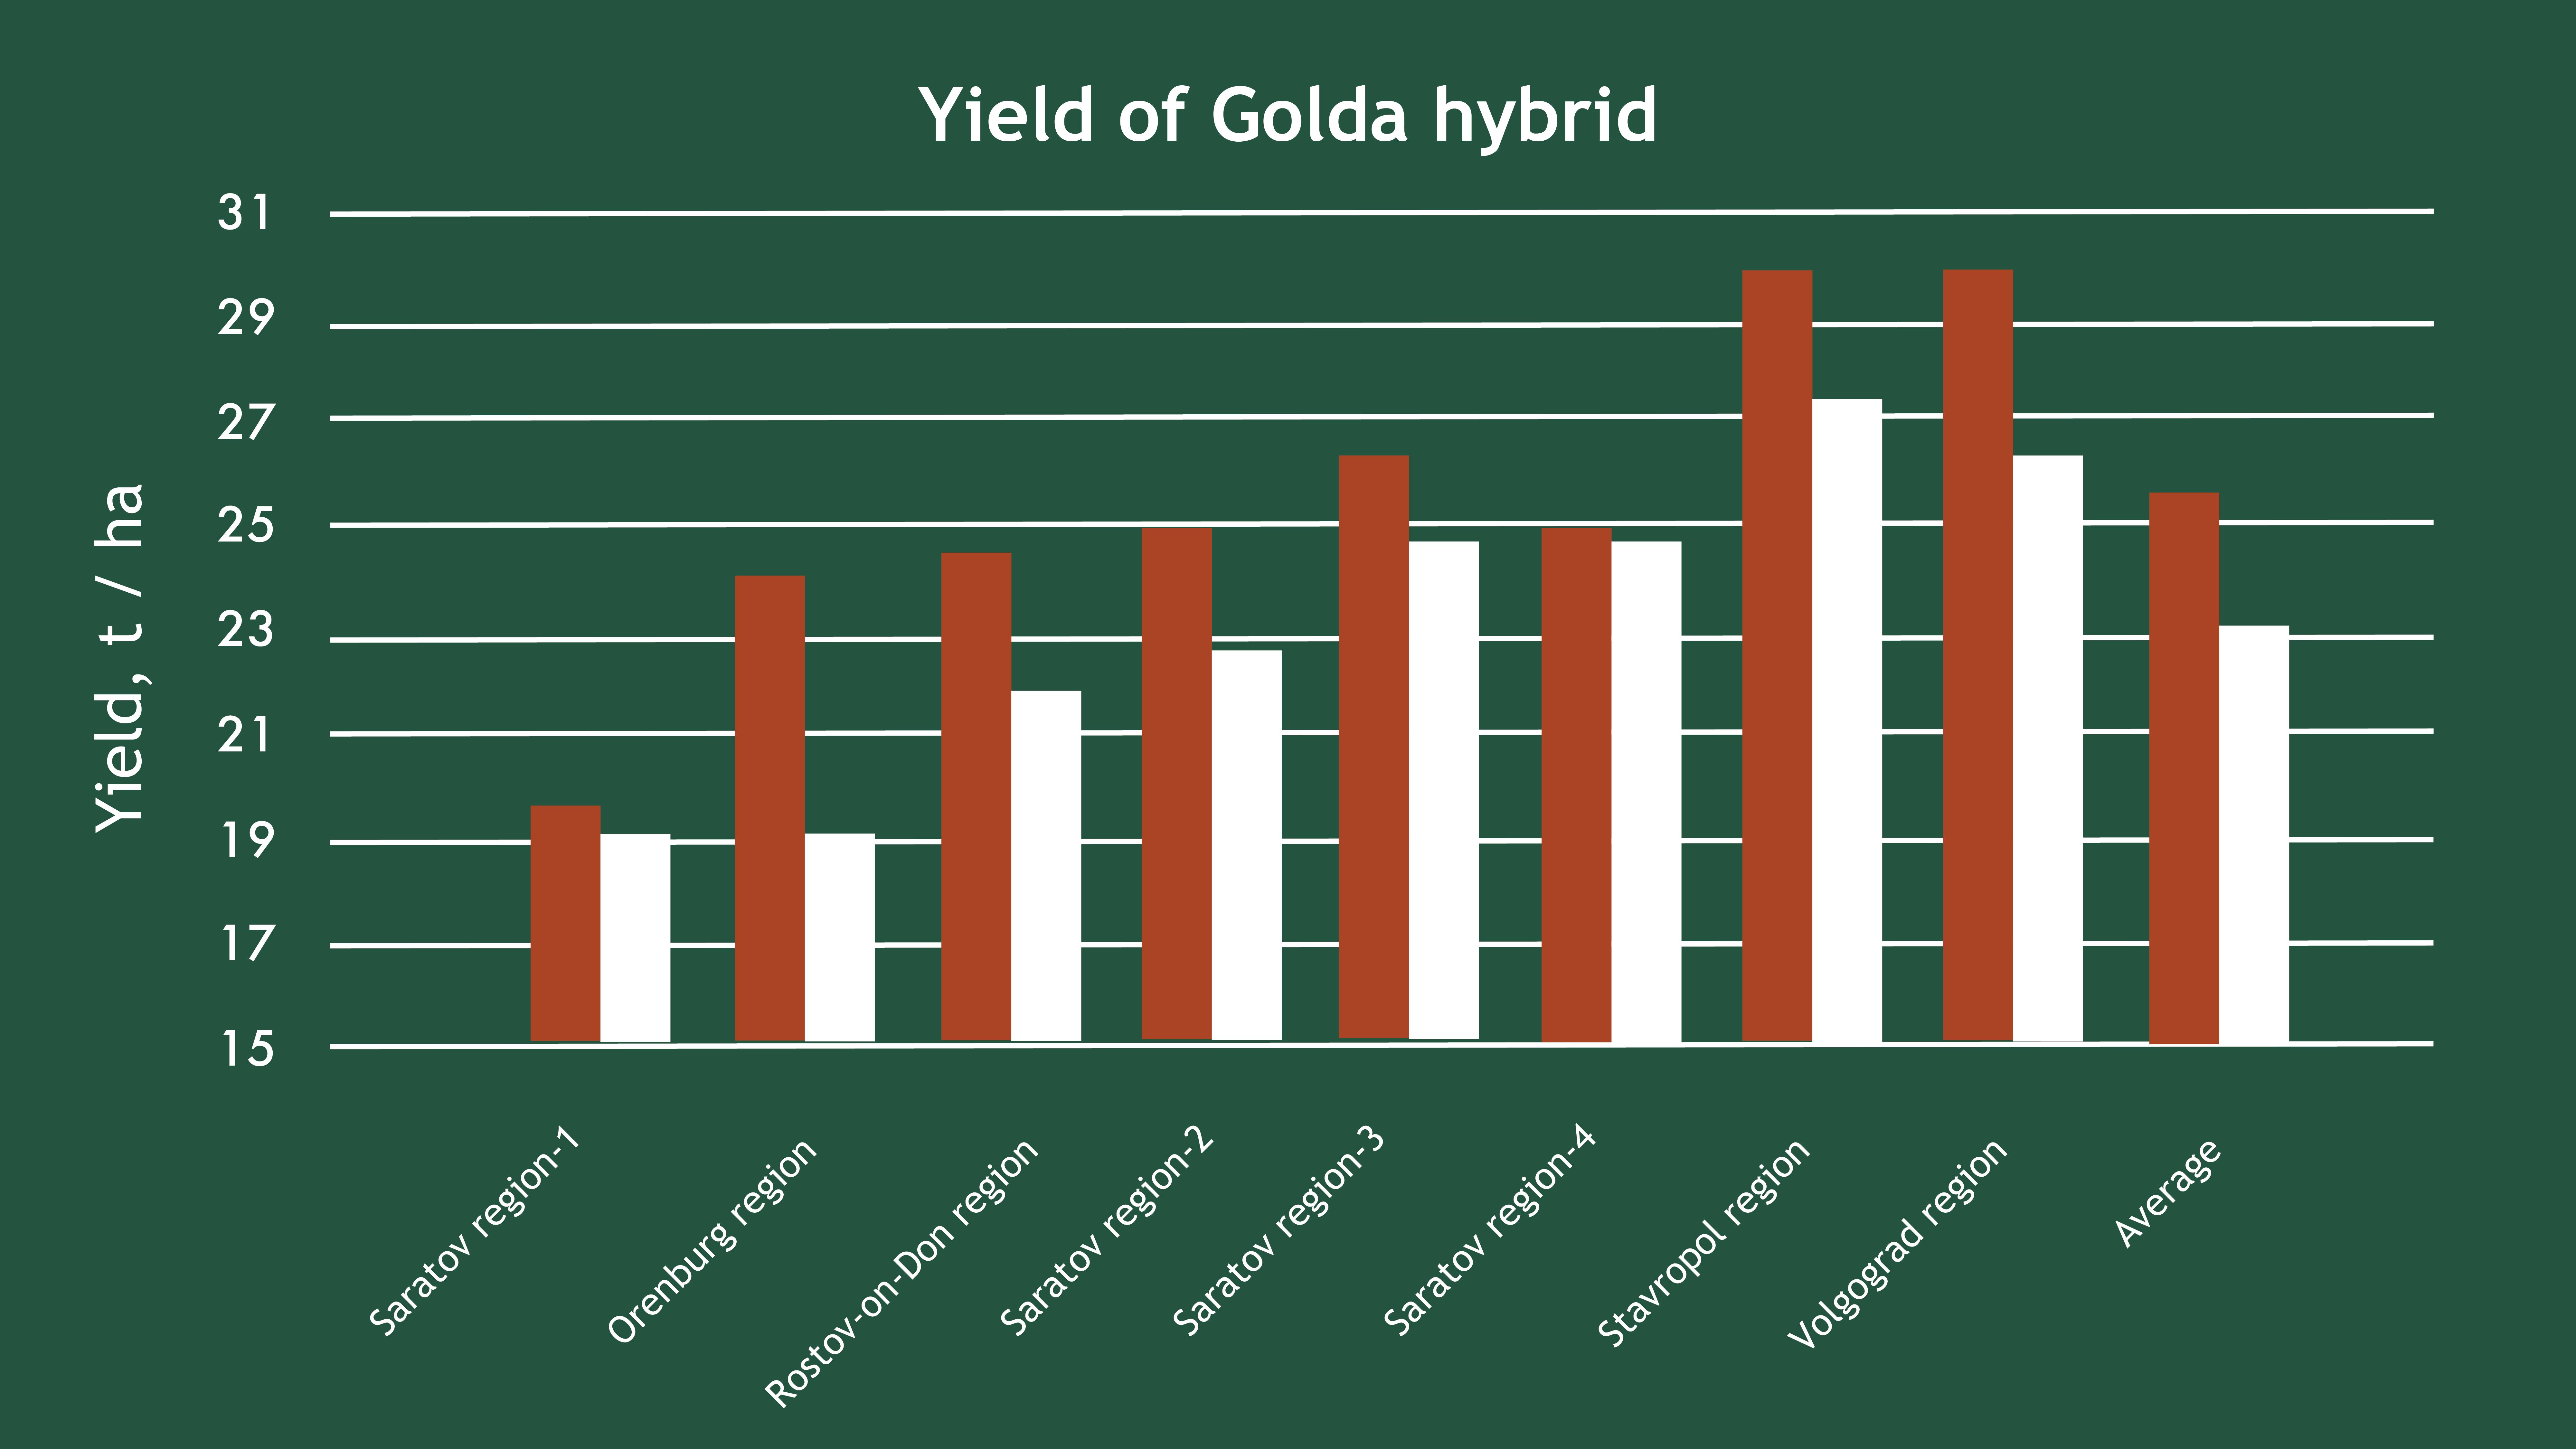 Productivity hybrid GOLDA